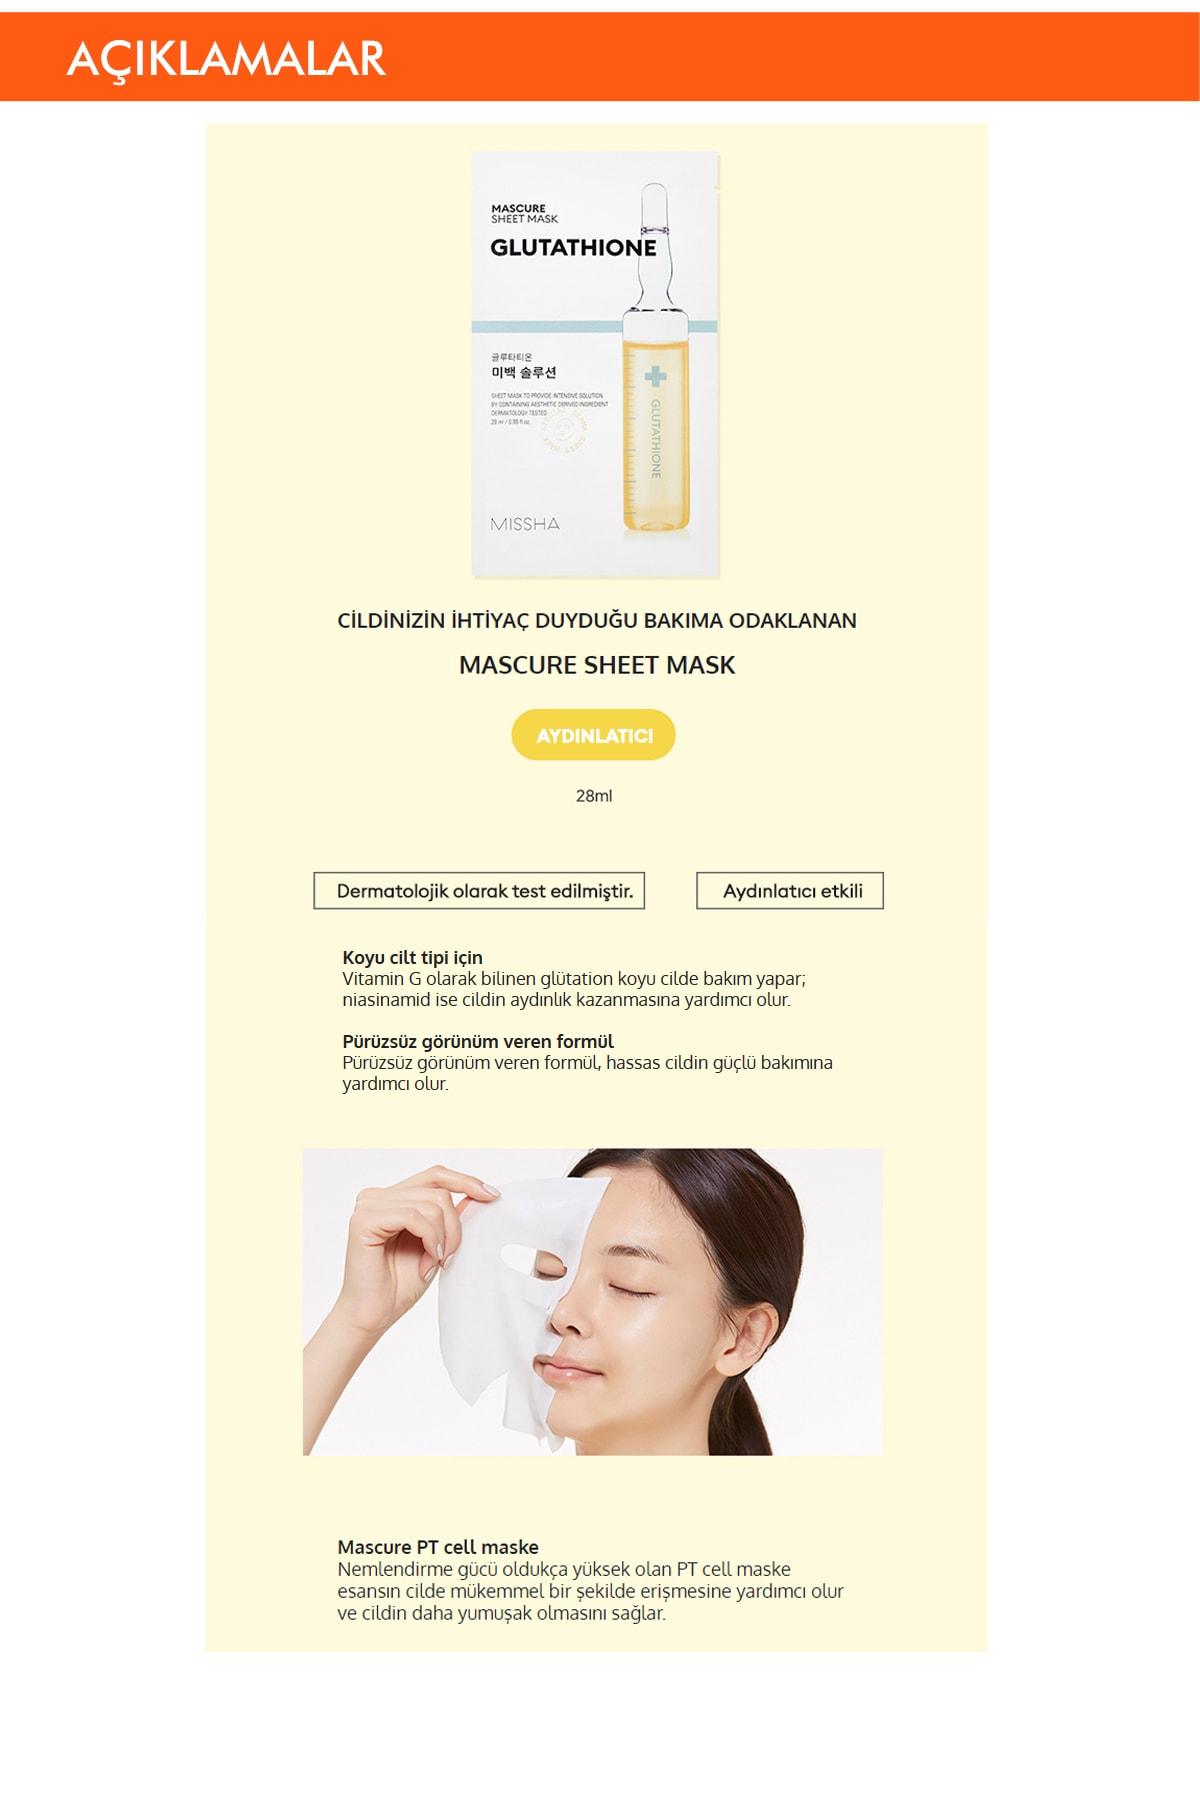 Missha Beyazlatıcı Glutathione Yaprak Maske (1ad) Mascure Whitening Solution Sheet Mask 1